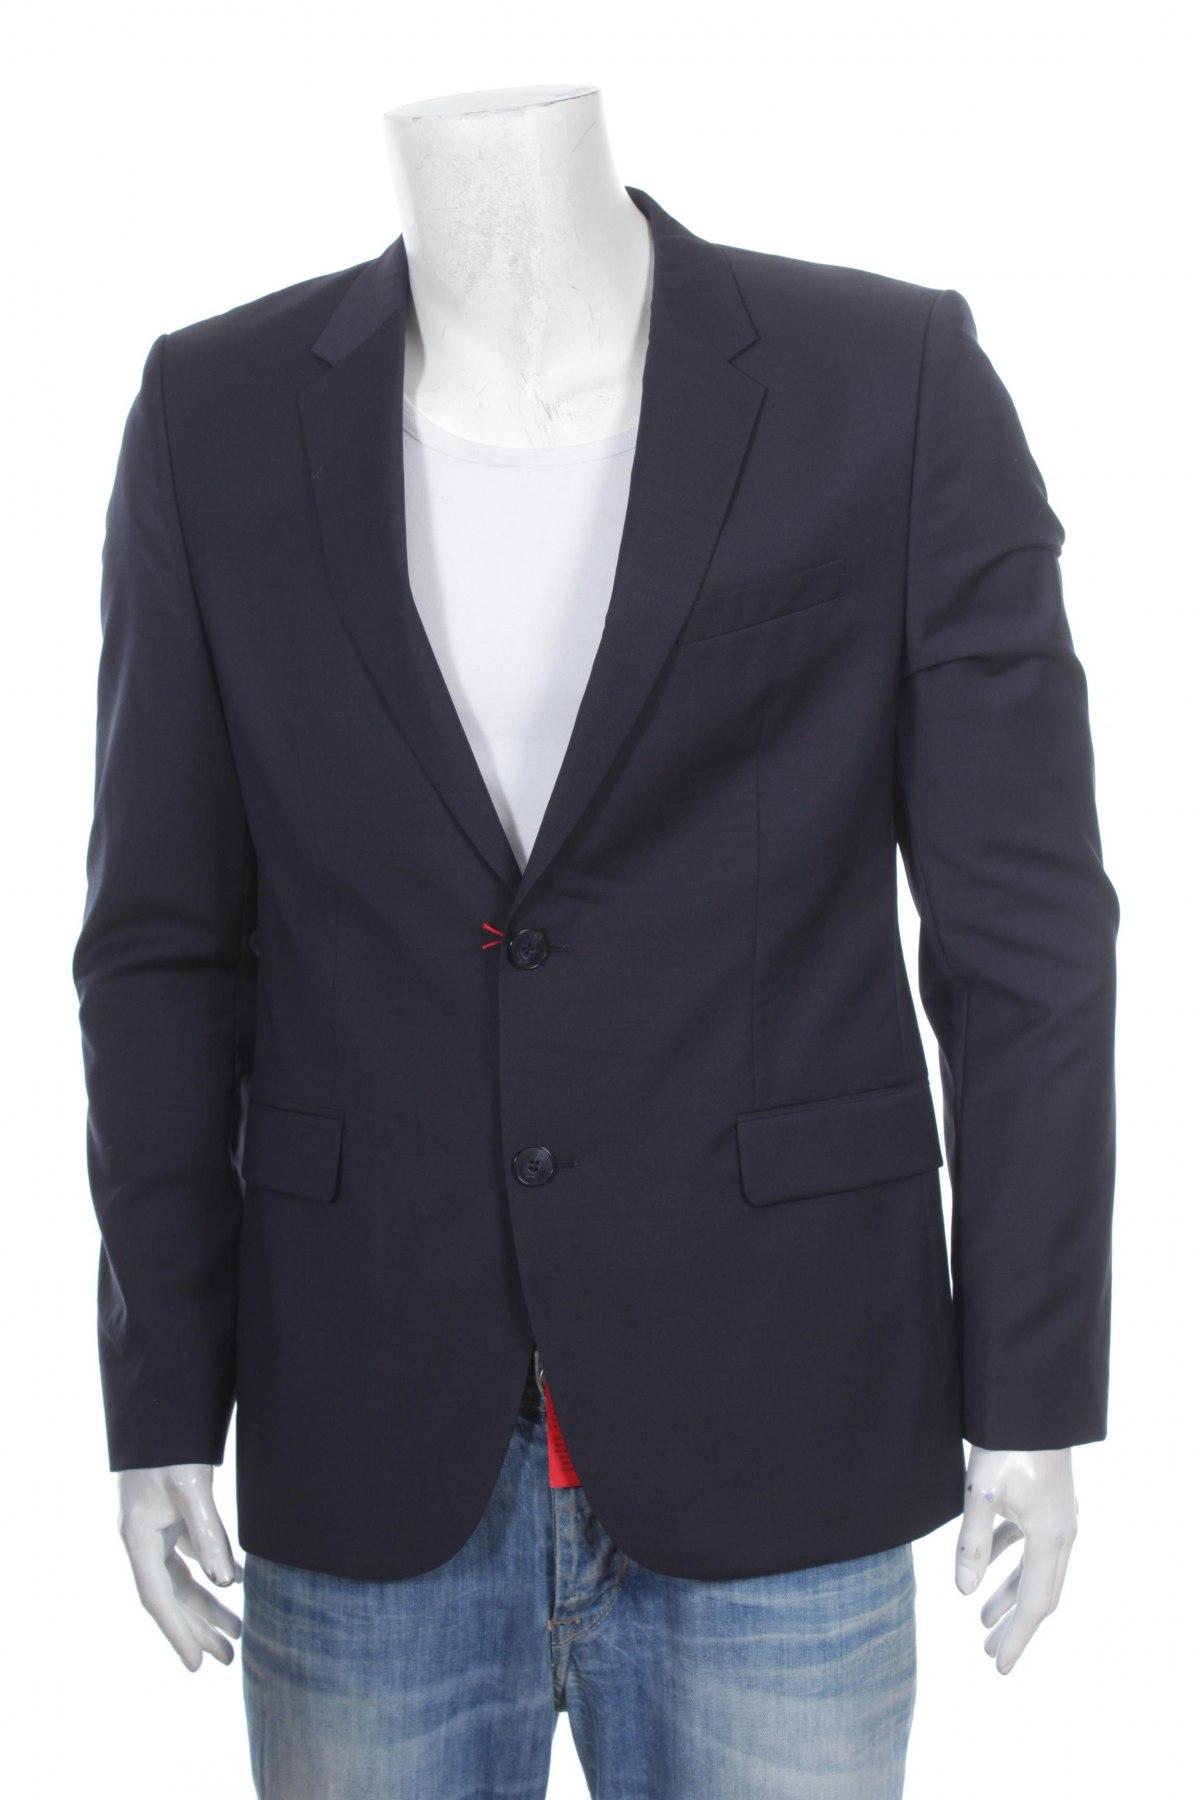 d924217565dc Ανδρικό σακάκι Hugo Boss - σε συμφέρουσα τιμή στο Remix -  8613646